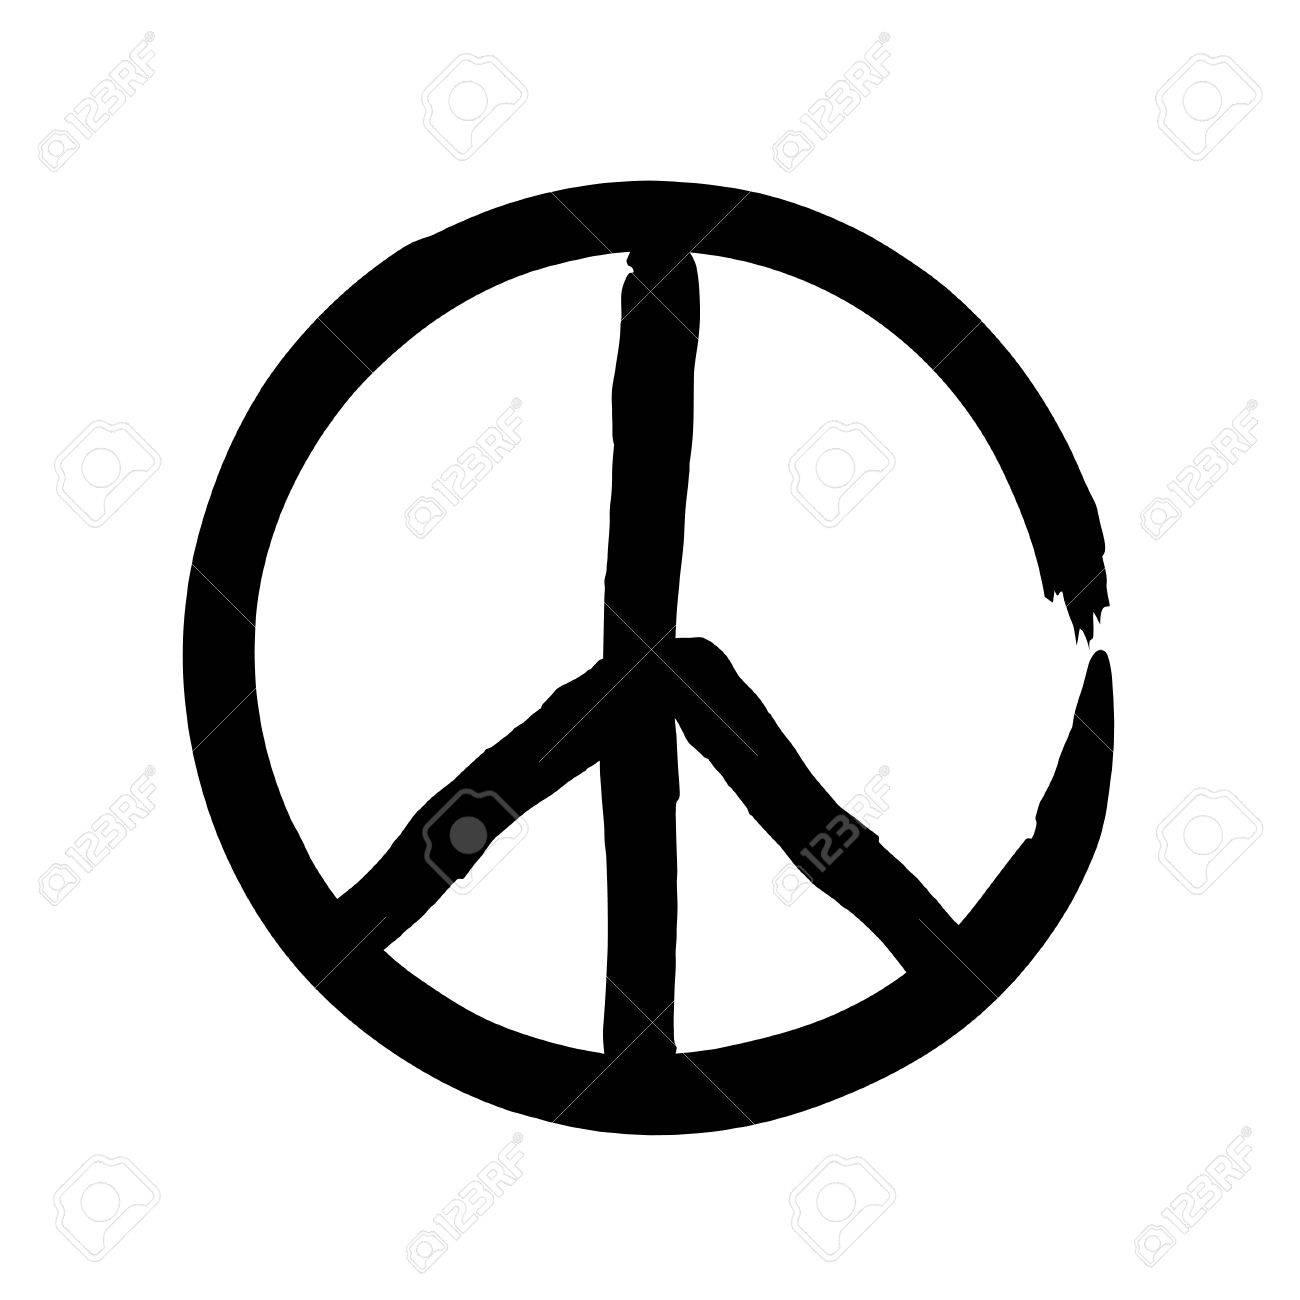 peace symbol icon vector peace symbol vector peace symbol design rh 123rf com vector peace sign fingers vector peace sign free